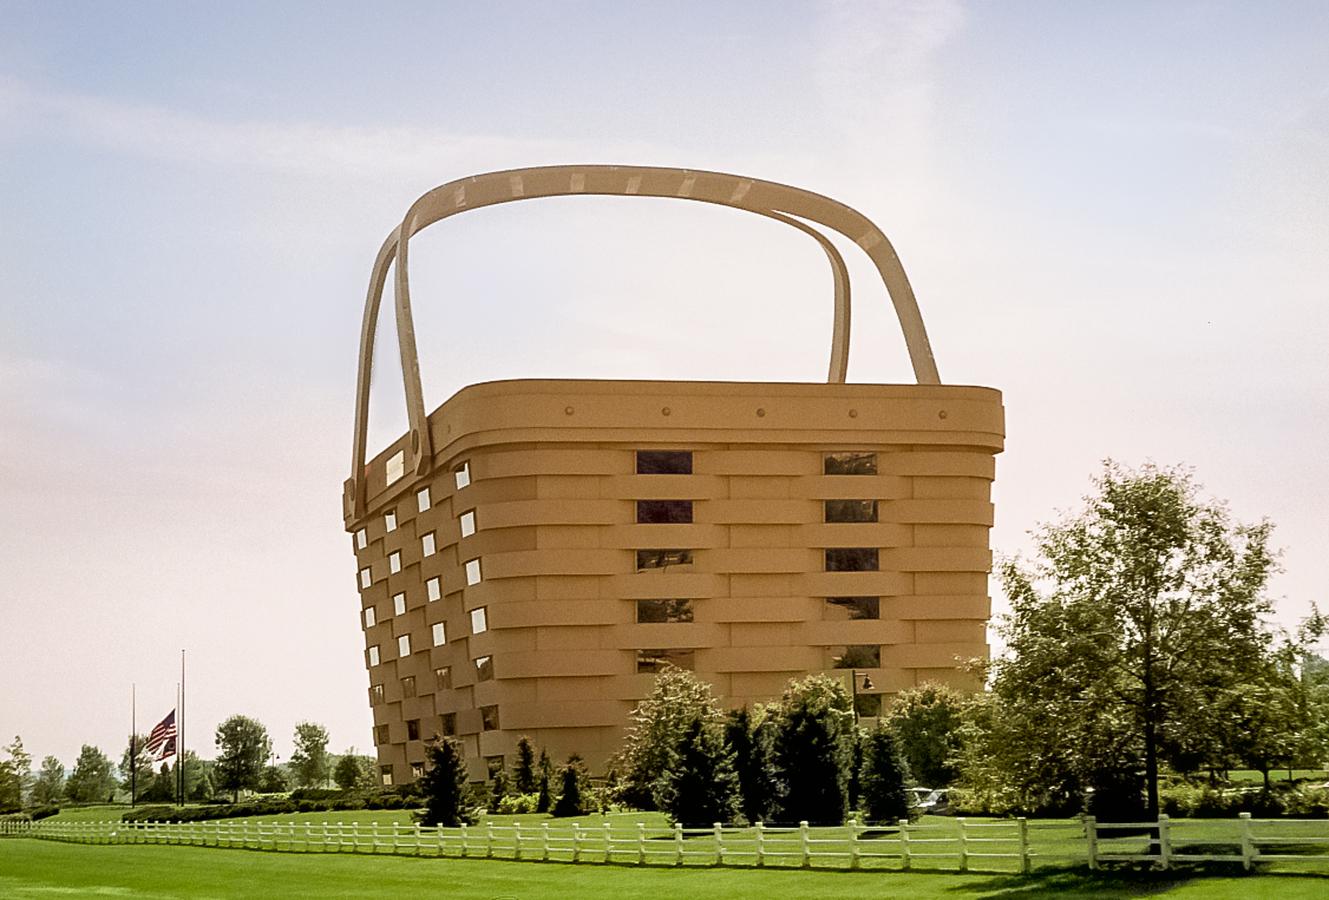 Na nákupu s košíkem